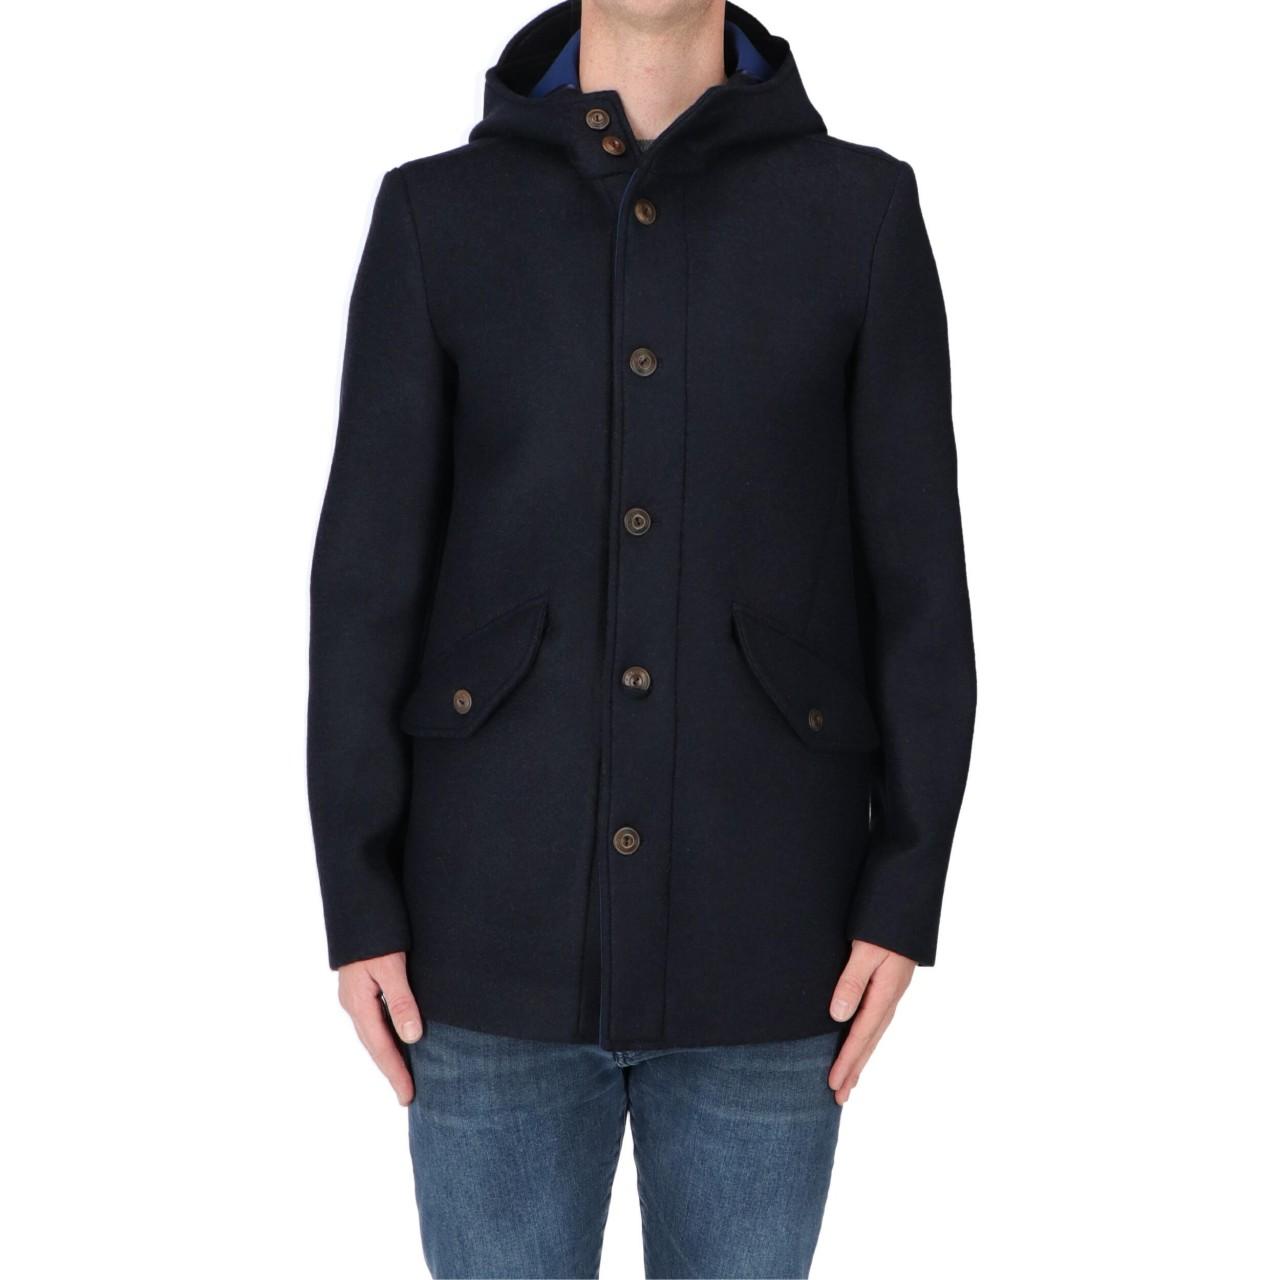 Ero jacket Uomo Giacca Ero Jacket Uomo Lana Cotta Neoprene Cappuccio ERO1106M